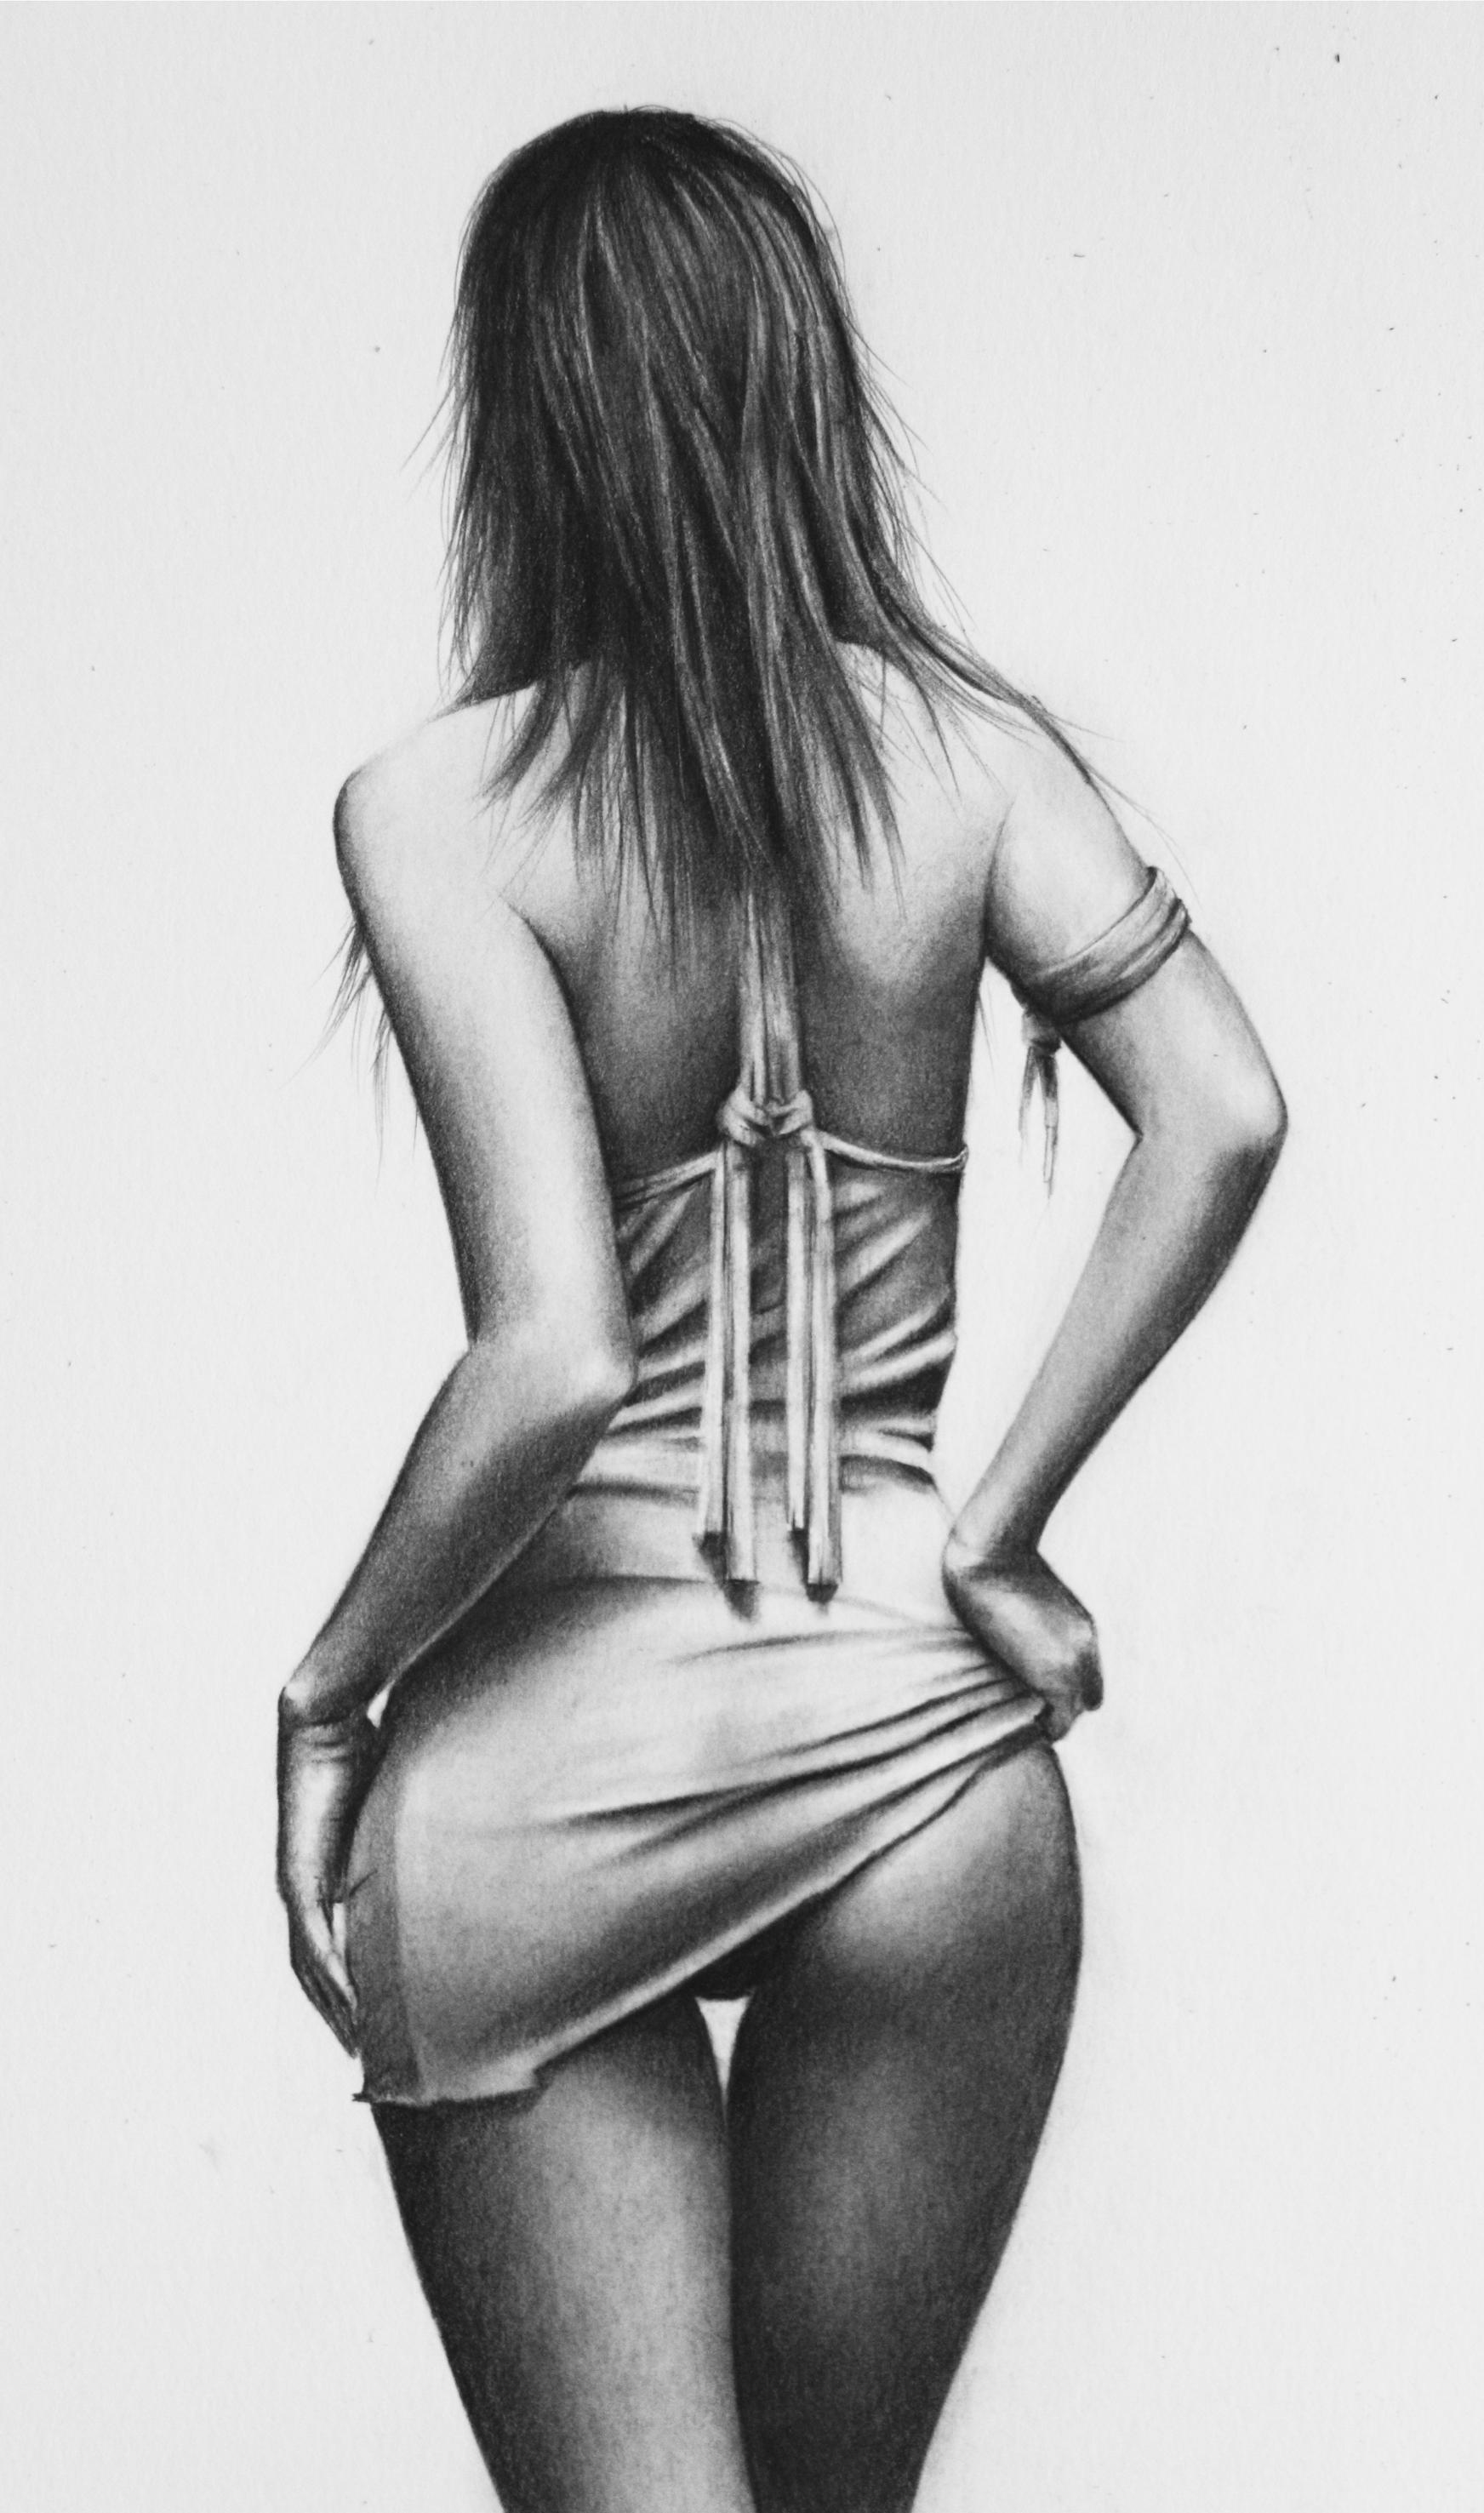 bill_higginson-graphite-drawing-realism-black-and-white